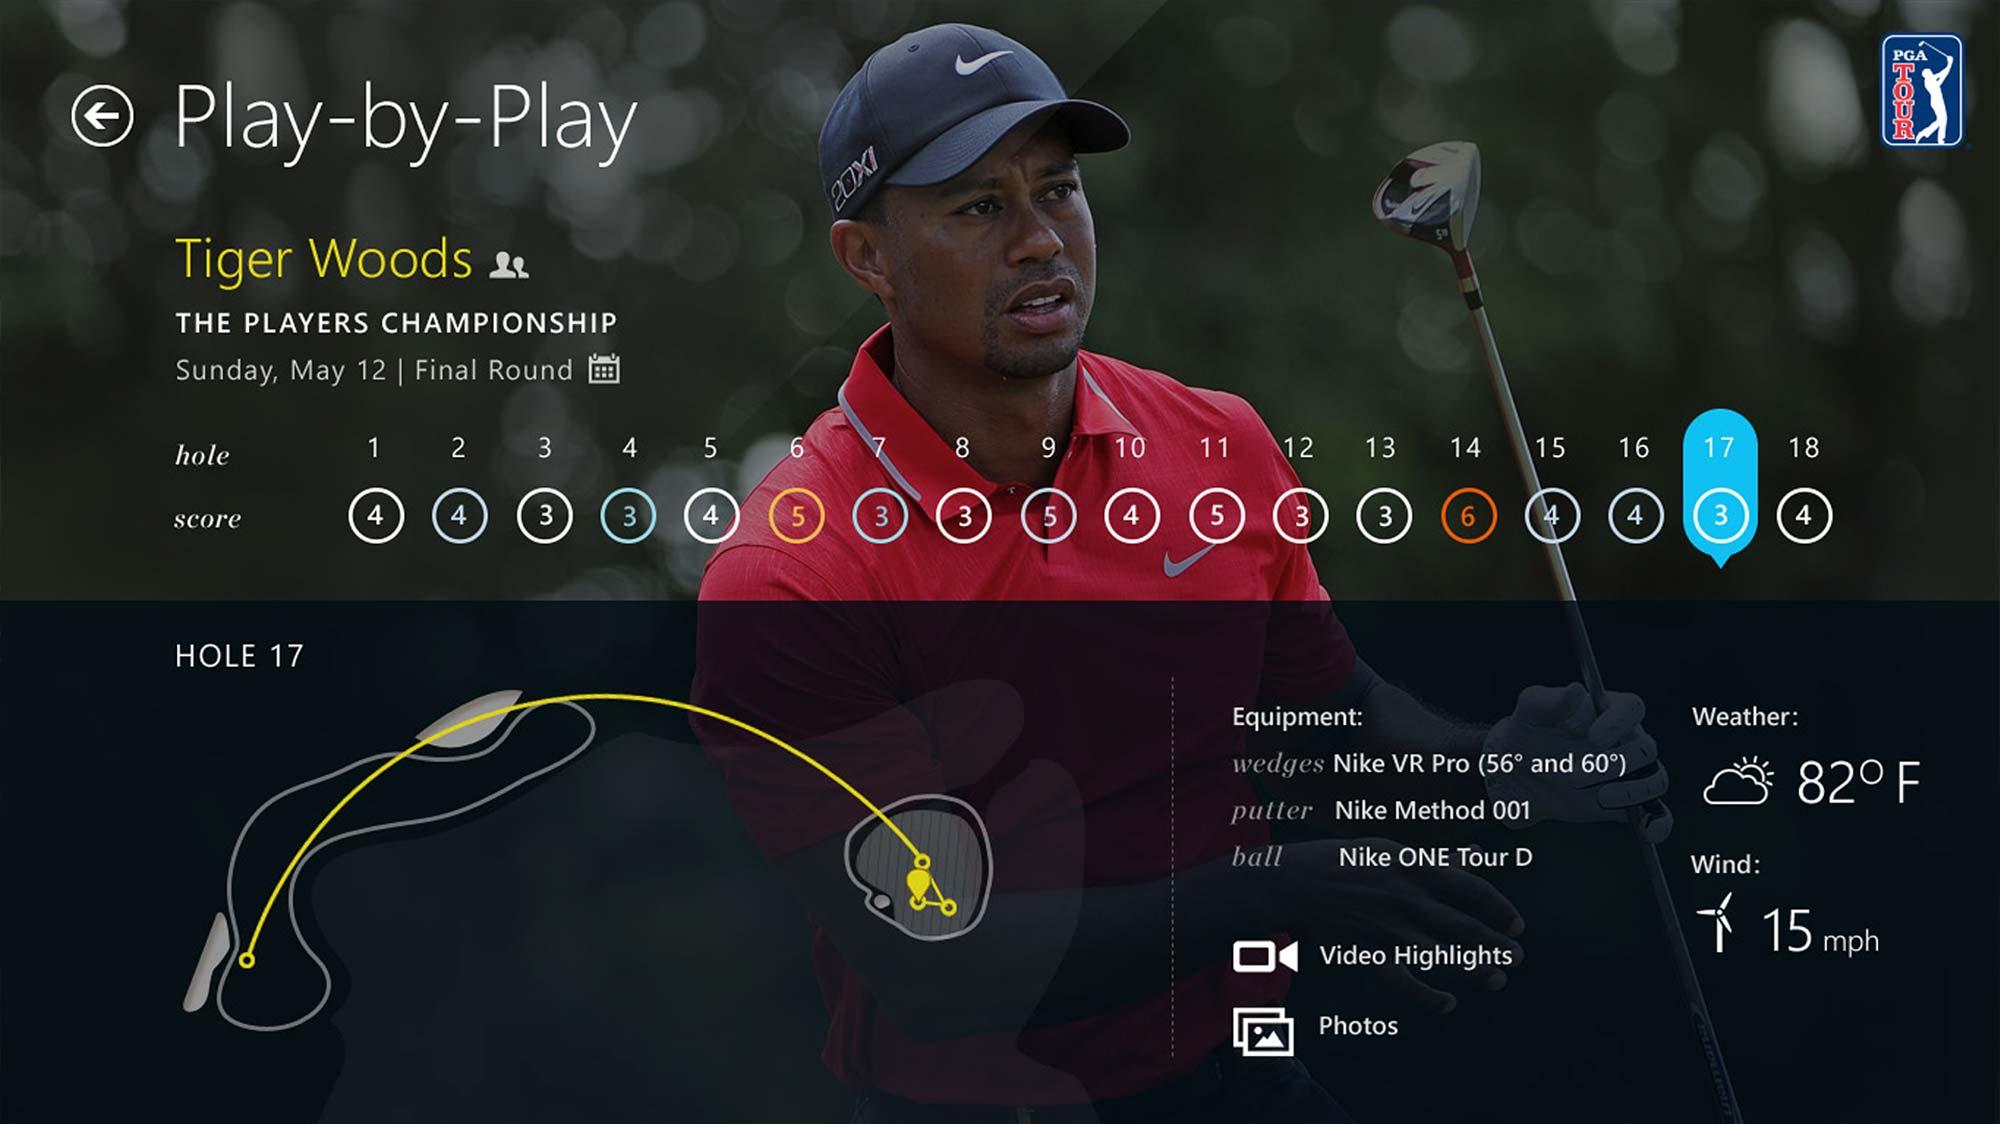 PGA Tour Windows 8 App Tablet Play-by-play Screen